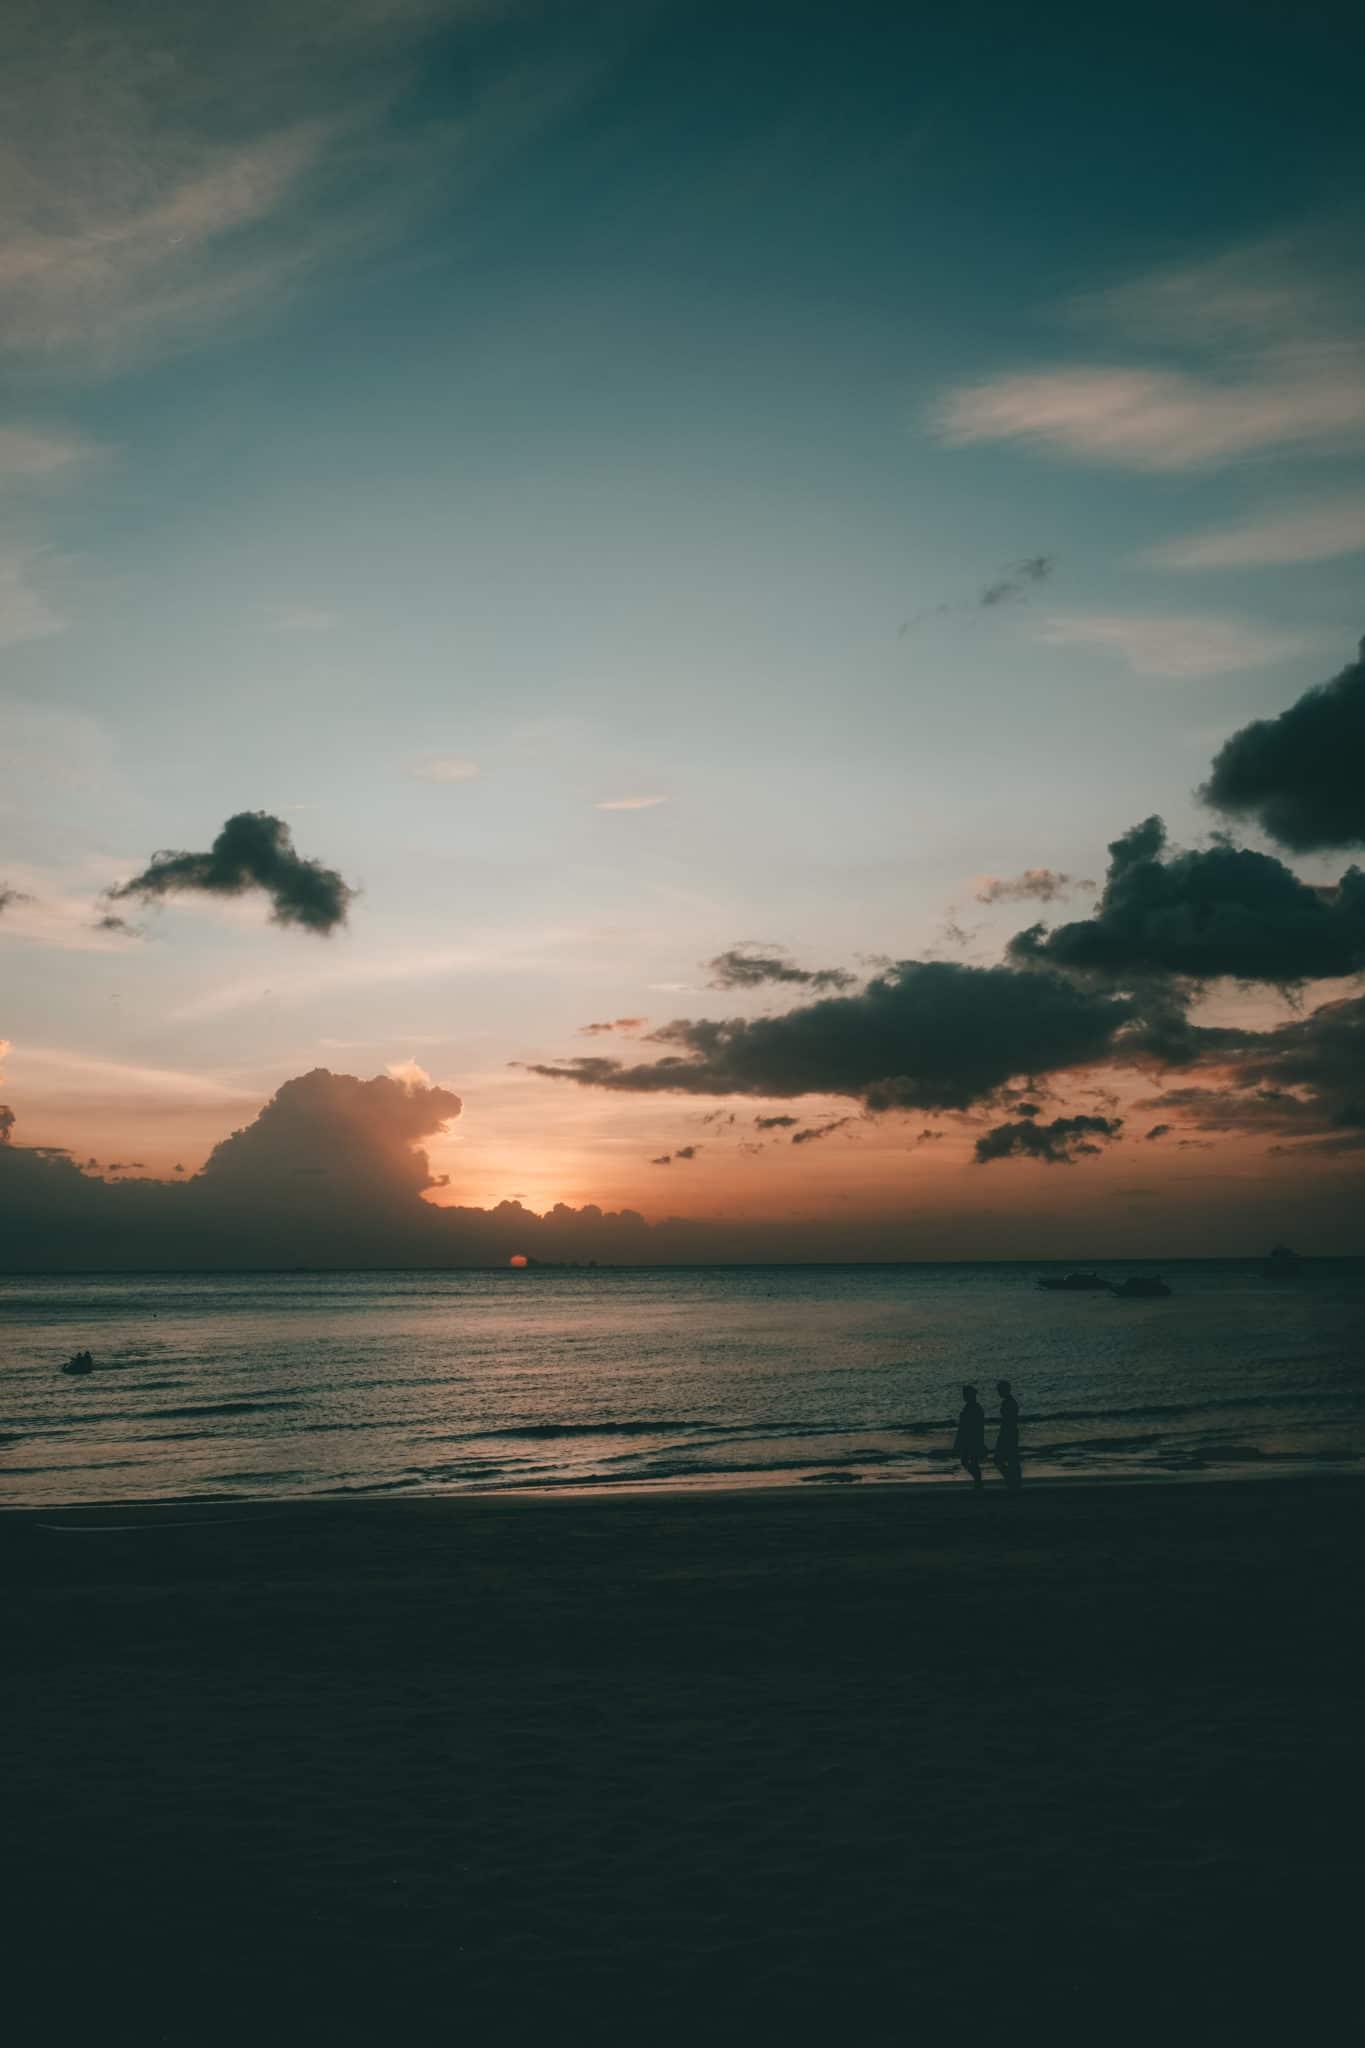 Thaïlande - les îles Koh Lanta Megane Arderighi